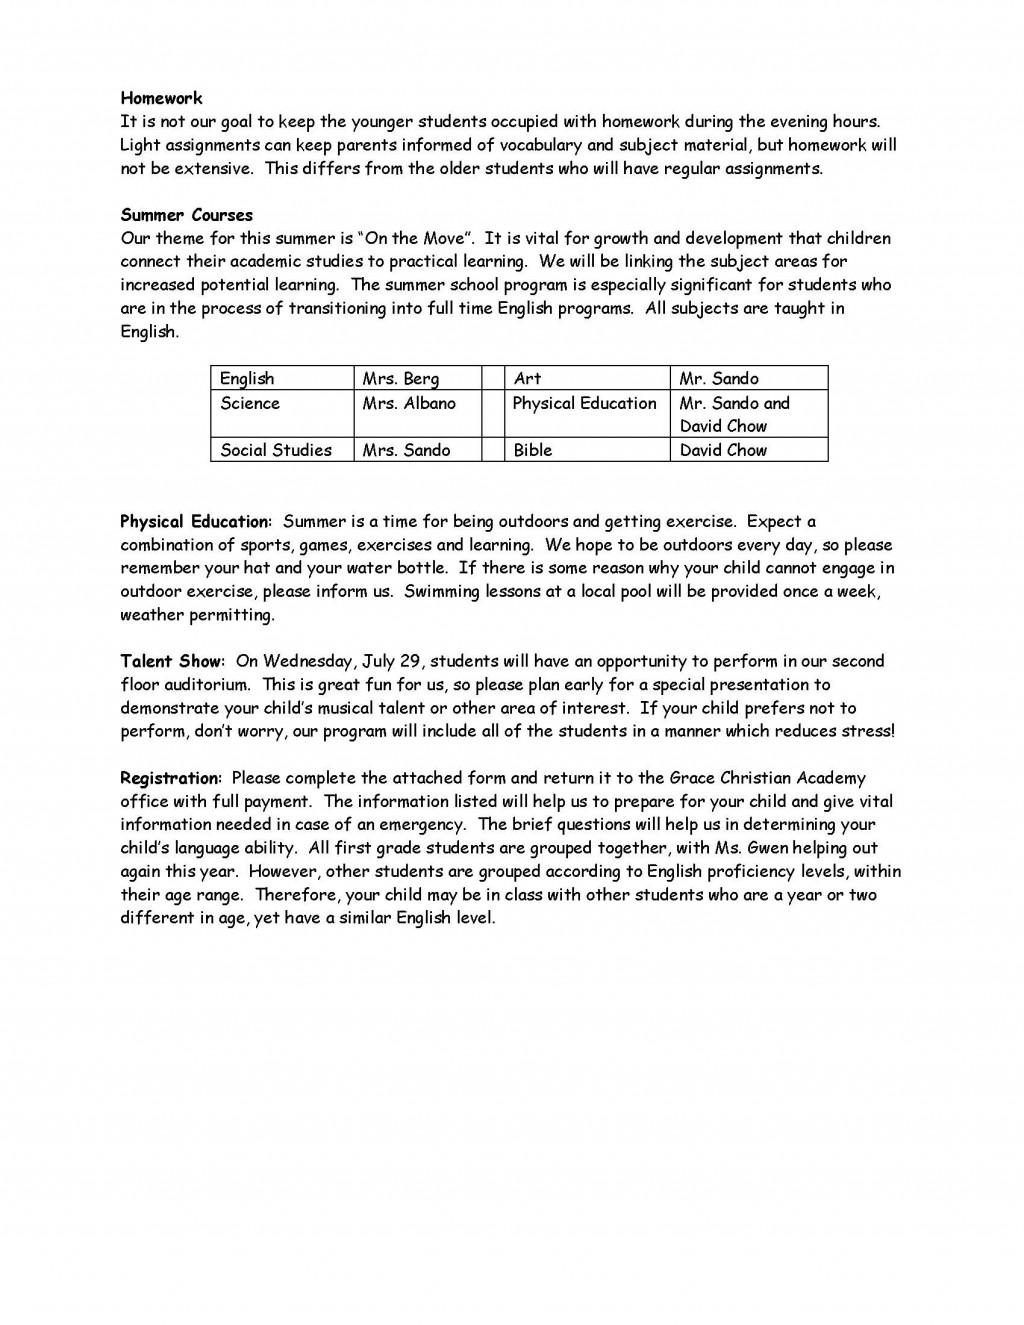 002 Smartphone Essay Summer School G1 G6 2015 Page 3 Awesome In Urdu Marathi Large